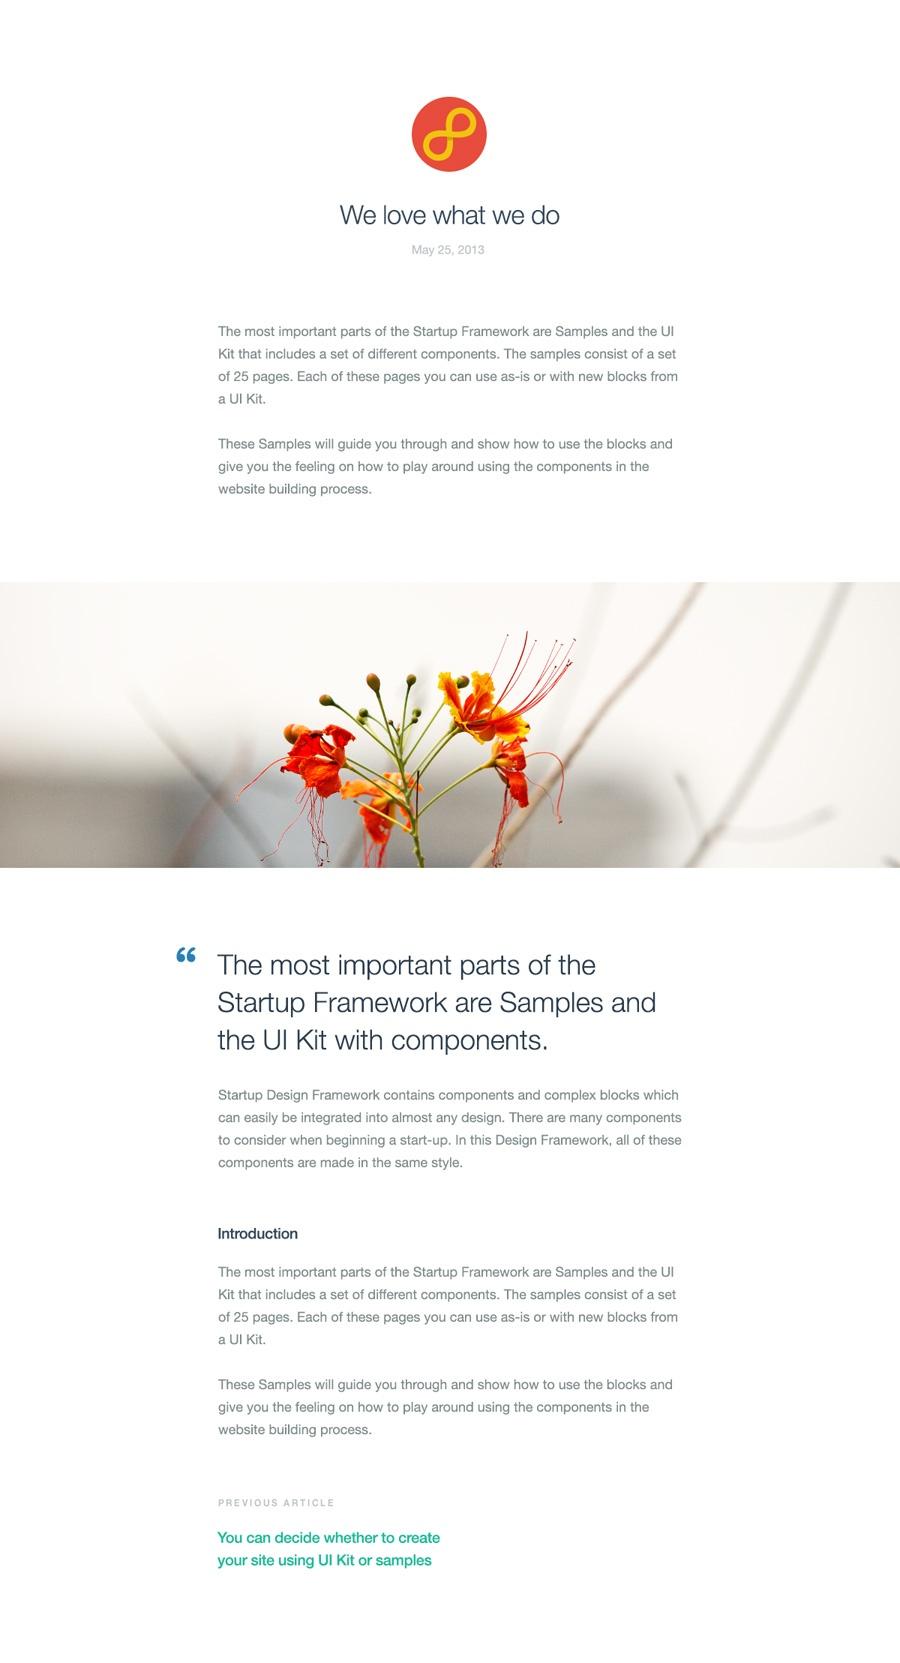 startup-framework-blog-2